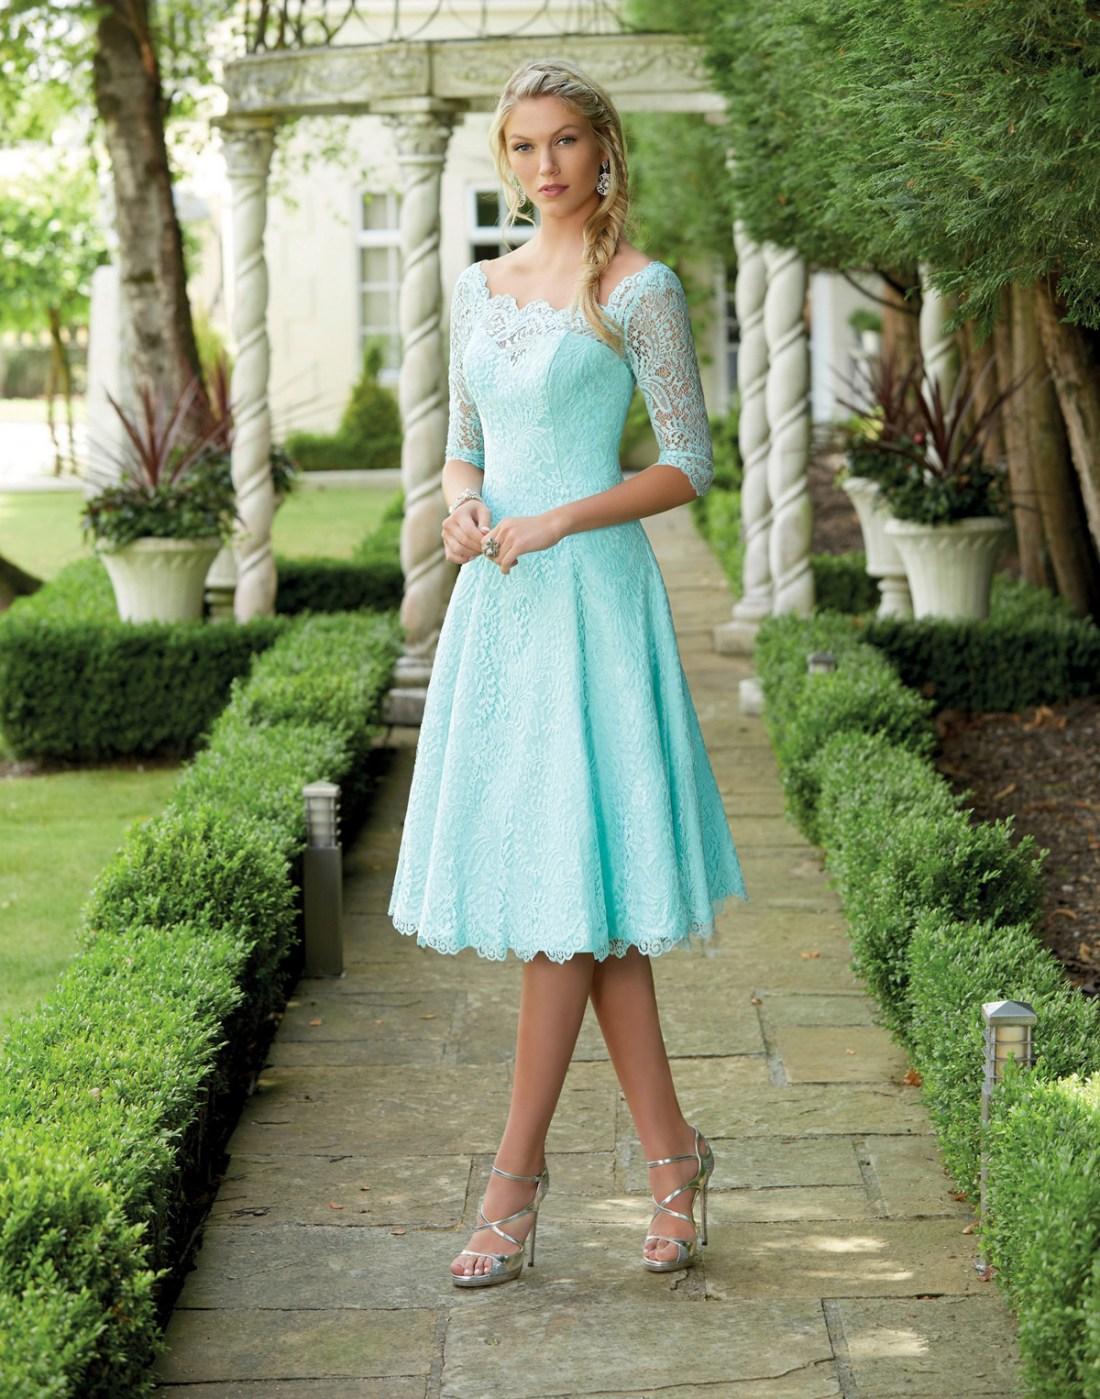 Going Out Dresses | Party & Cocktail Dresses | Lace, Sequin & Cutout